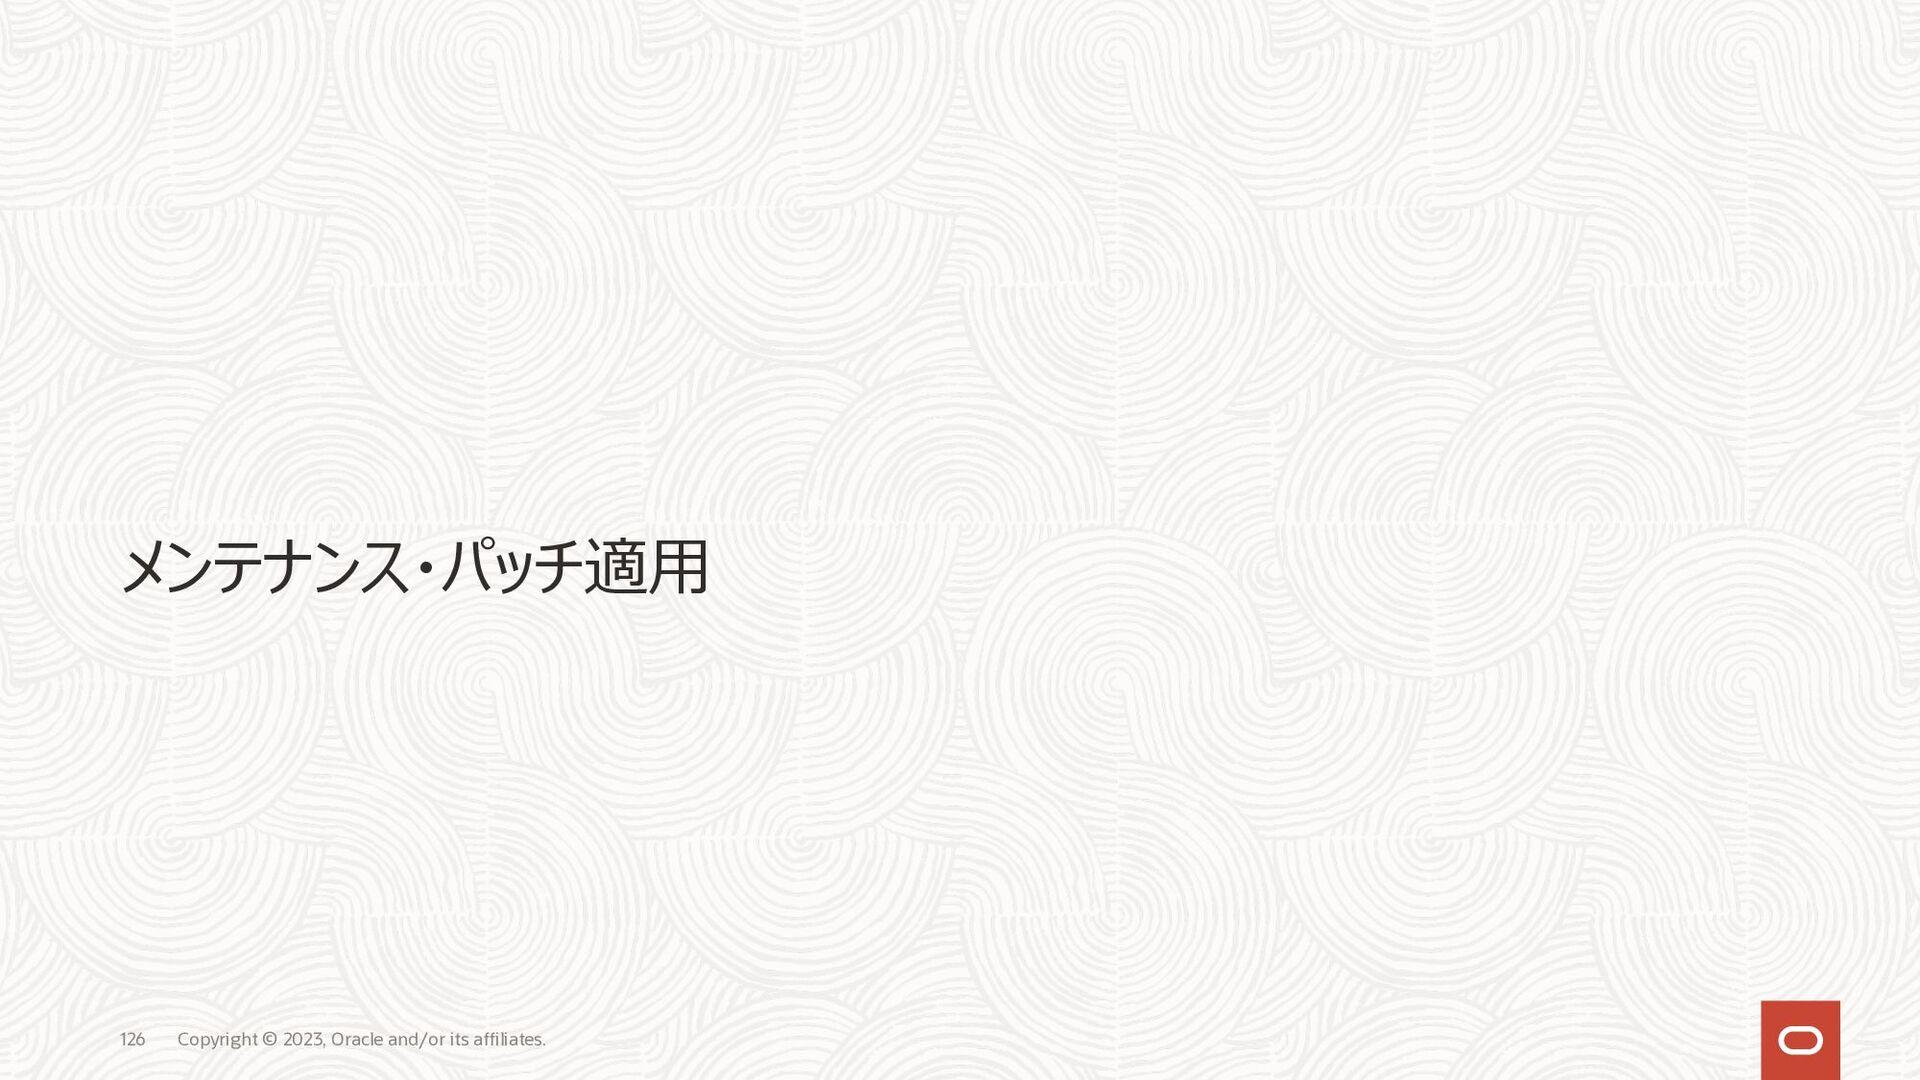 GoldenGate on OCI Marketplace 特別プログラム(補足) Copyr...